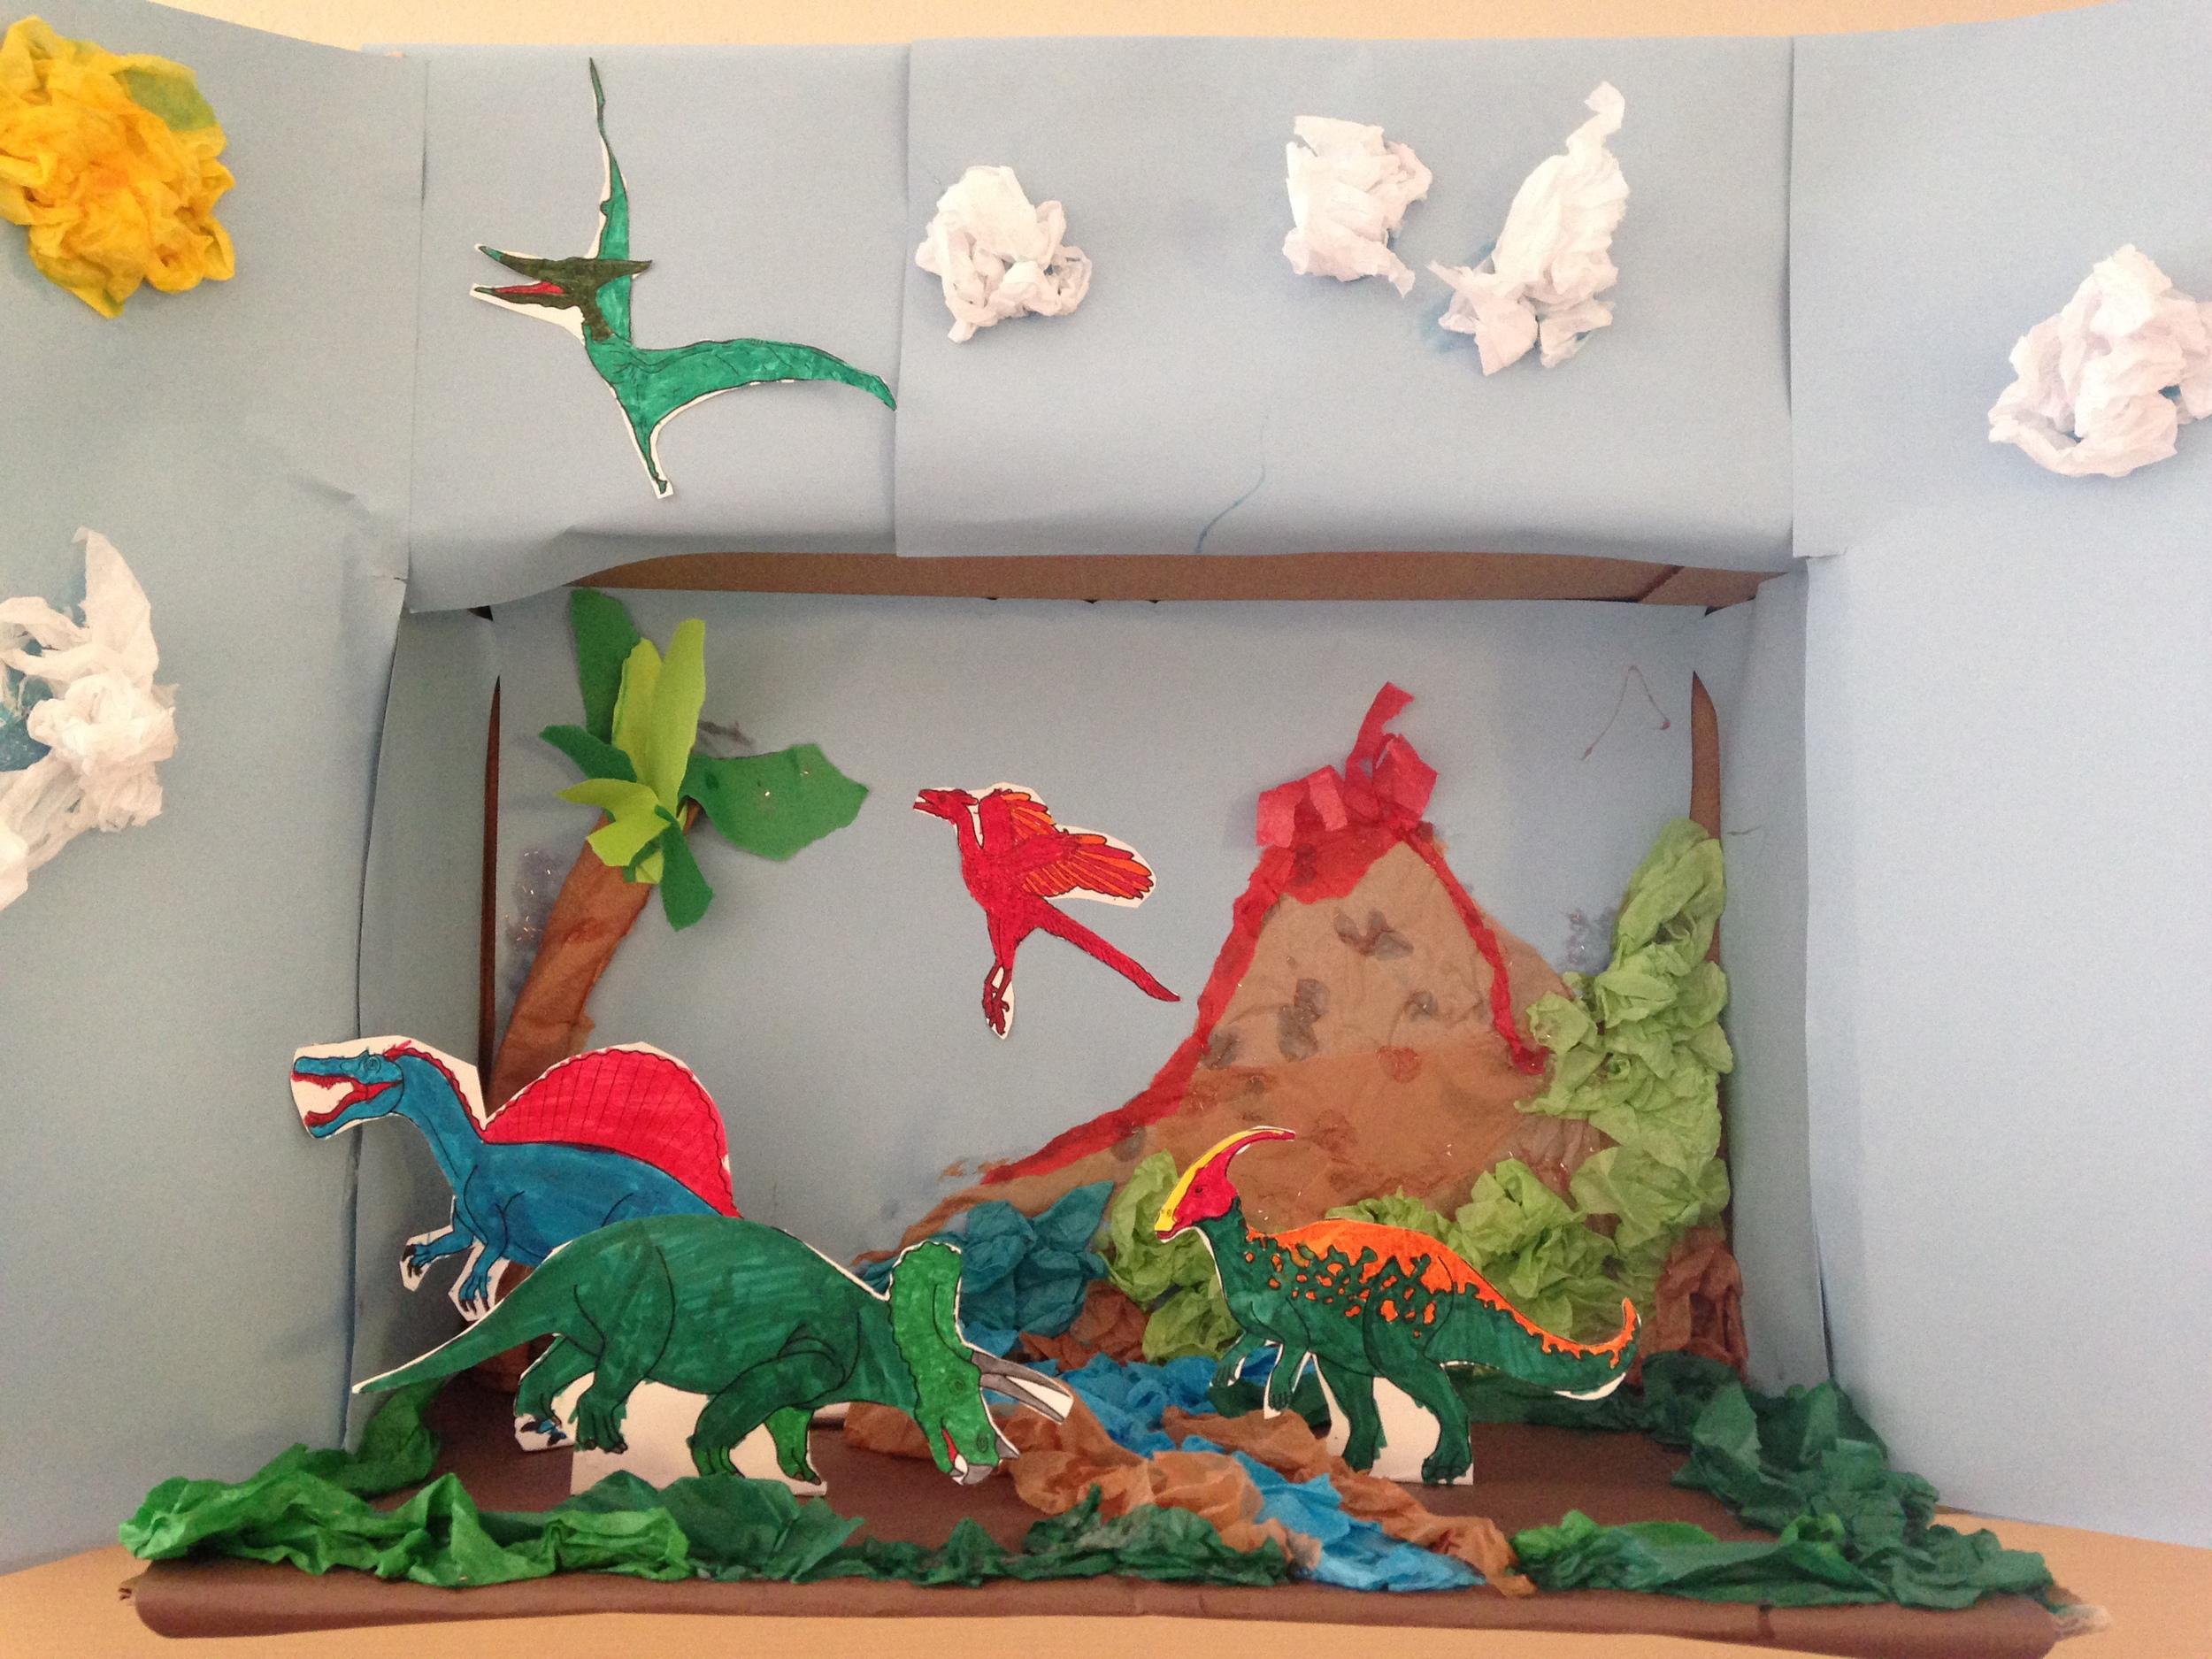 Dylan's diorama.